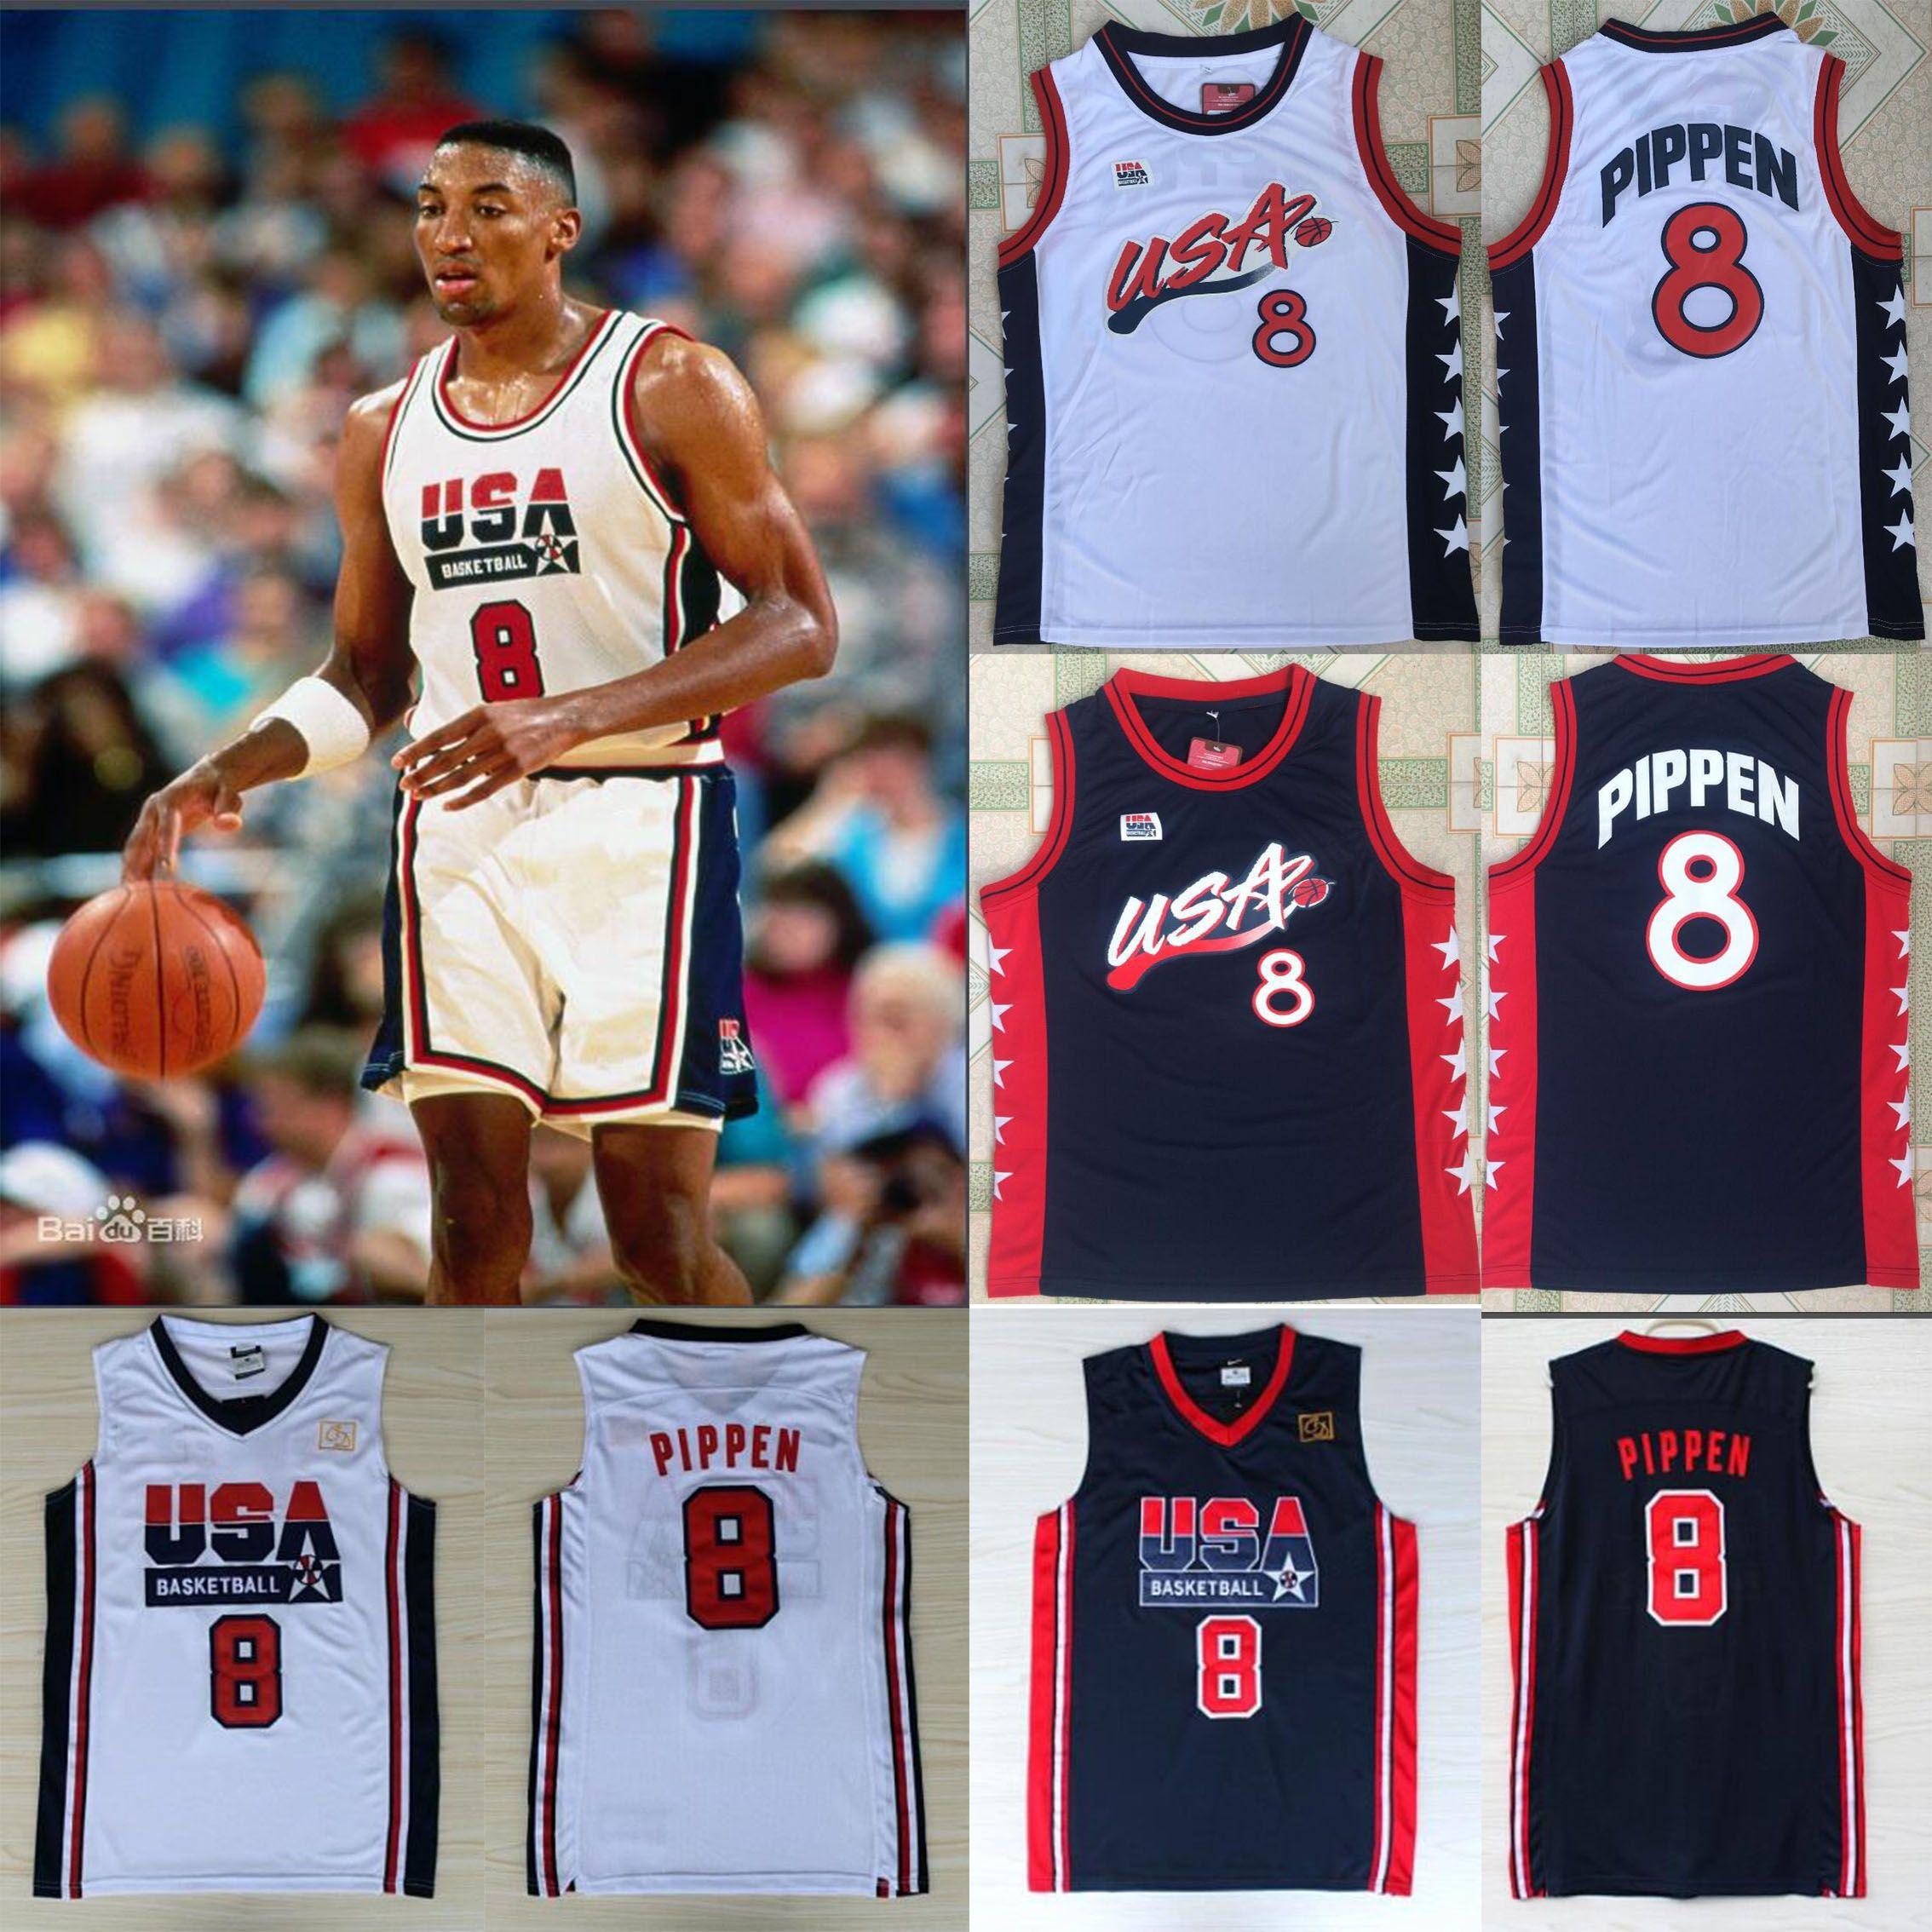 Juegos Olímpicos Dream team # 8 Scottie Pippen Camisetas de baloncesto camiseta de baloncesto tamaño S-XXL